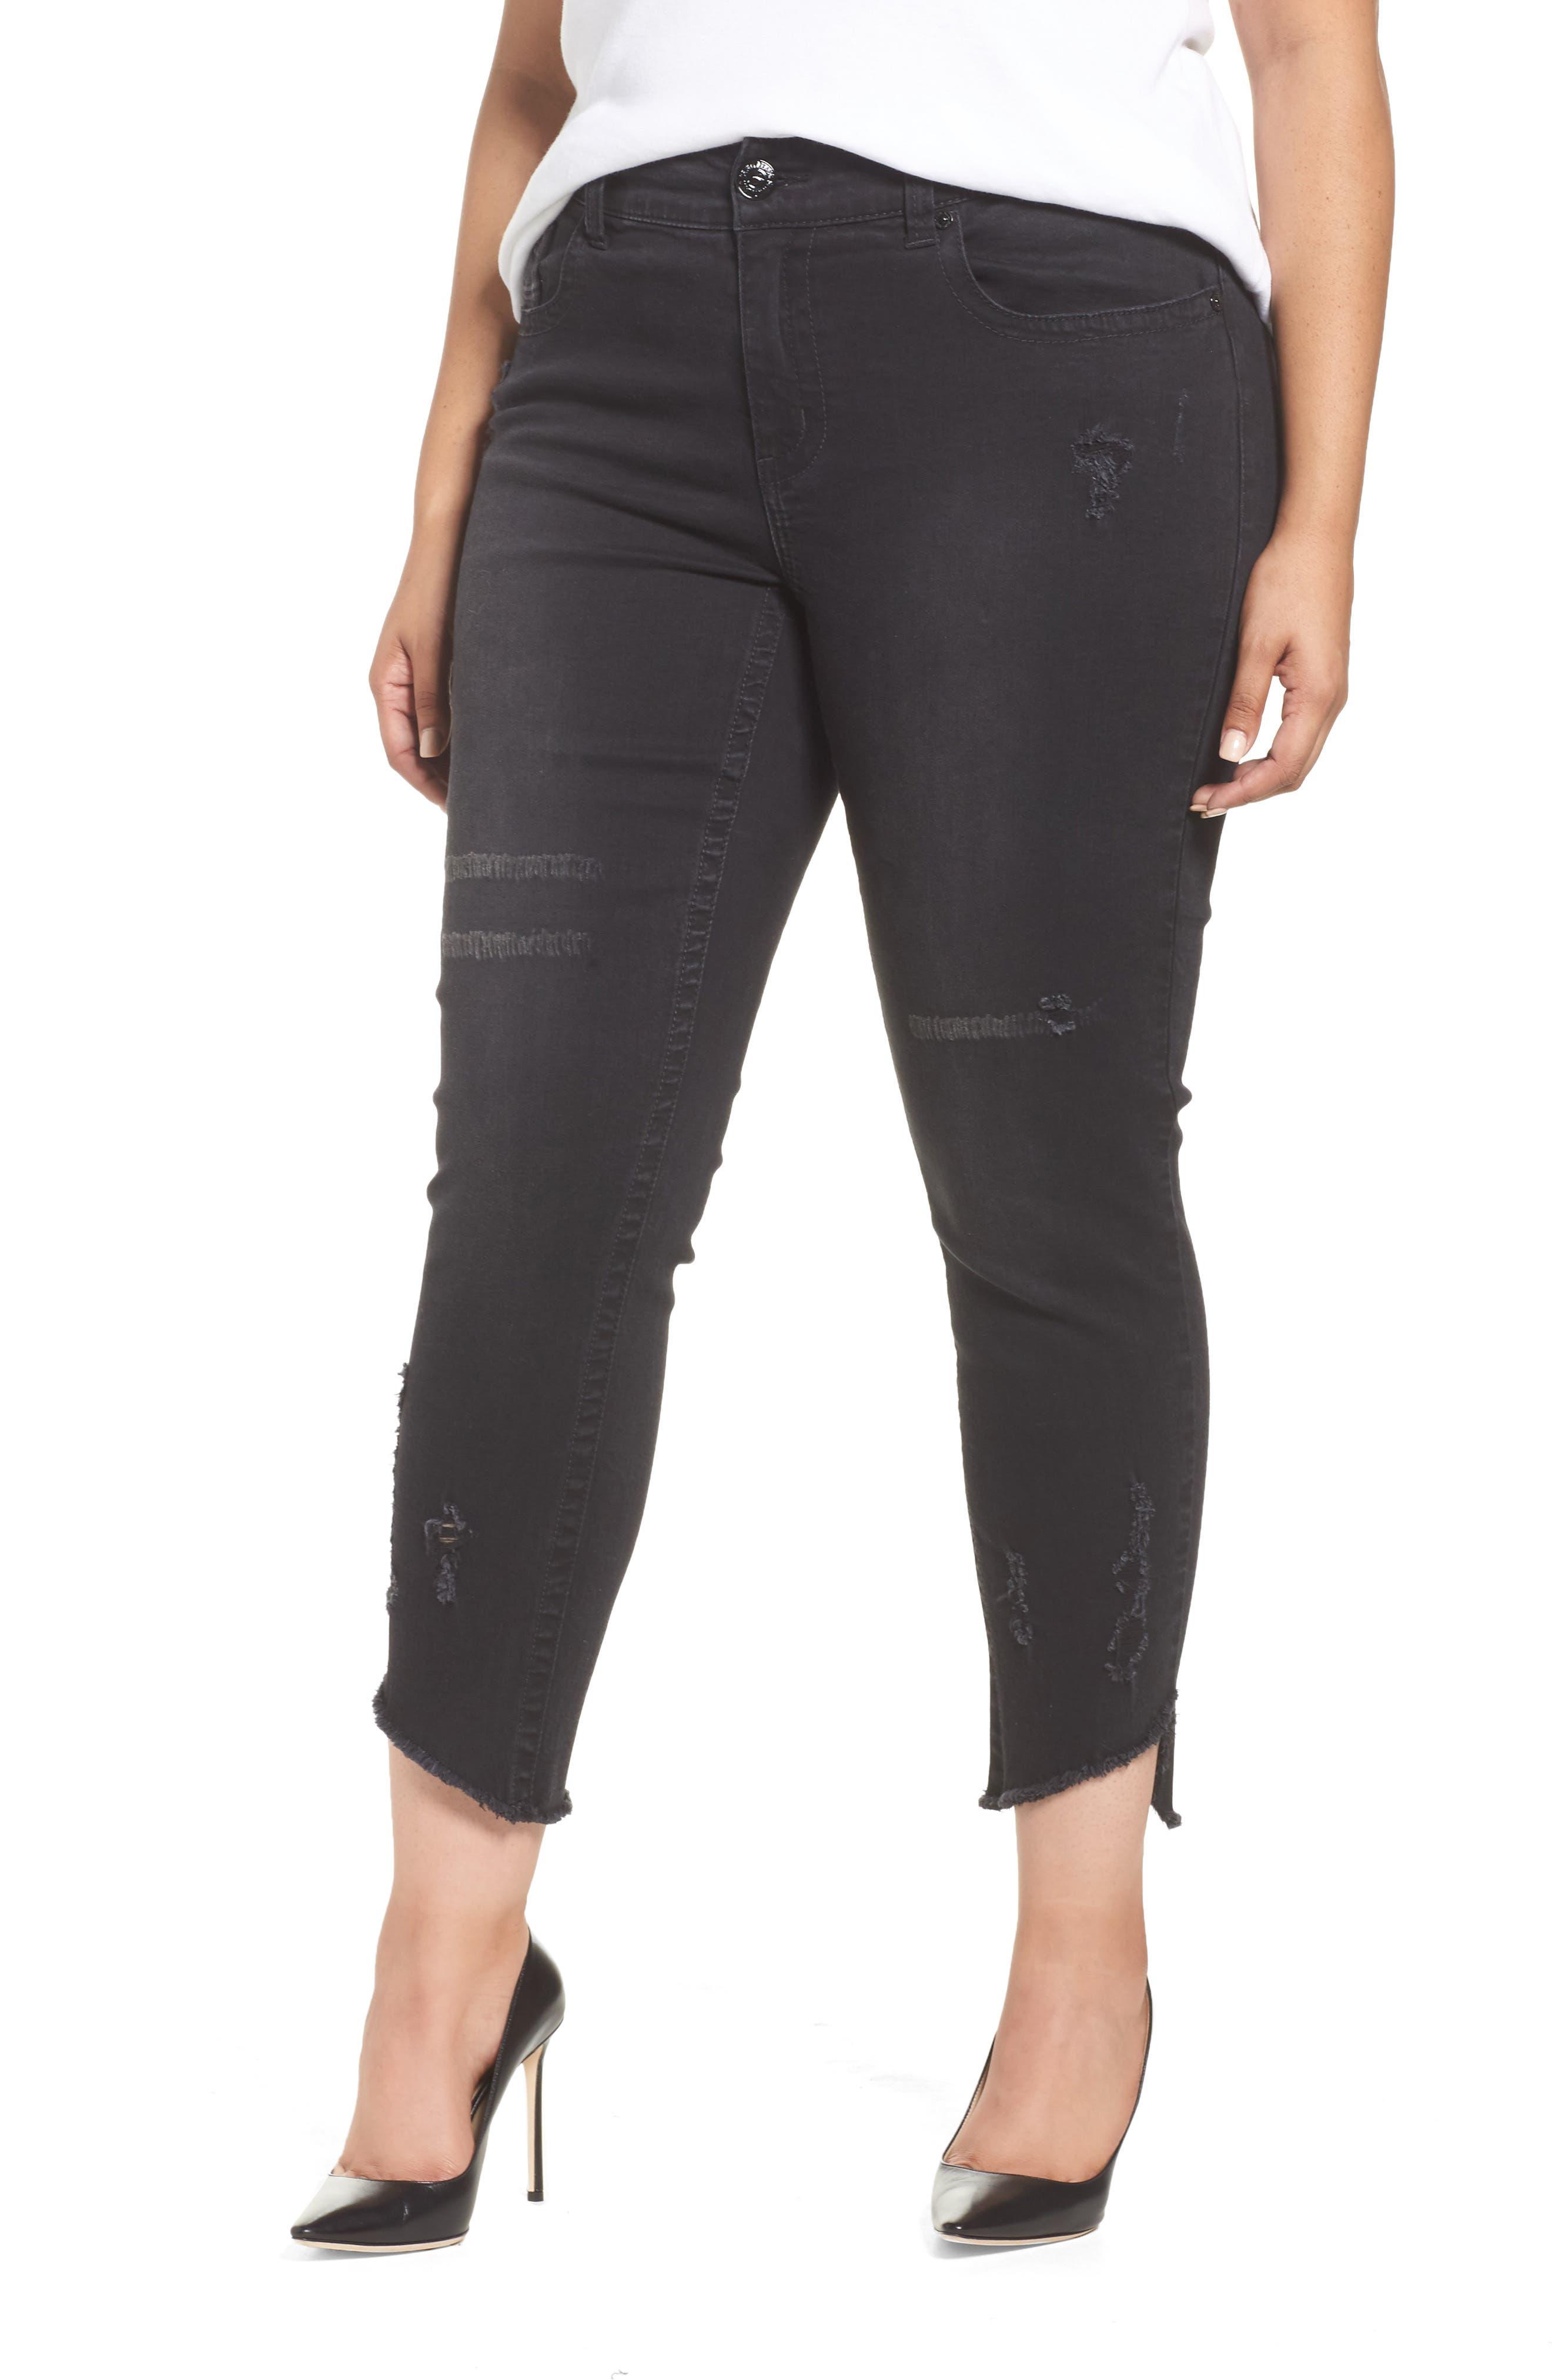 SEVEN7 Distressed Slant Raw Hem Skinny Jeans, Main, color, 001